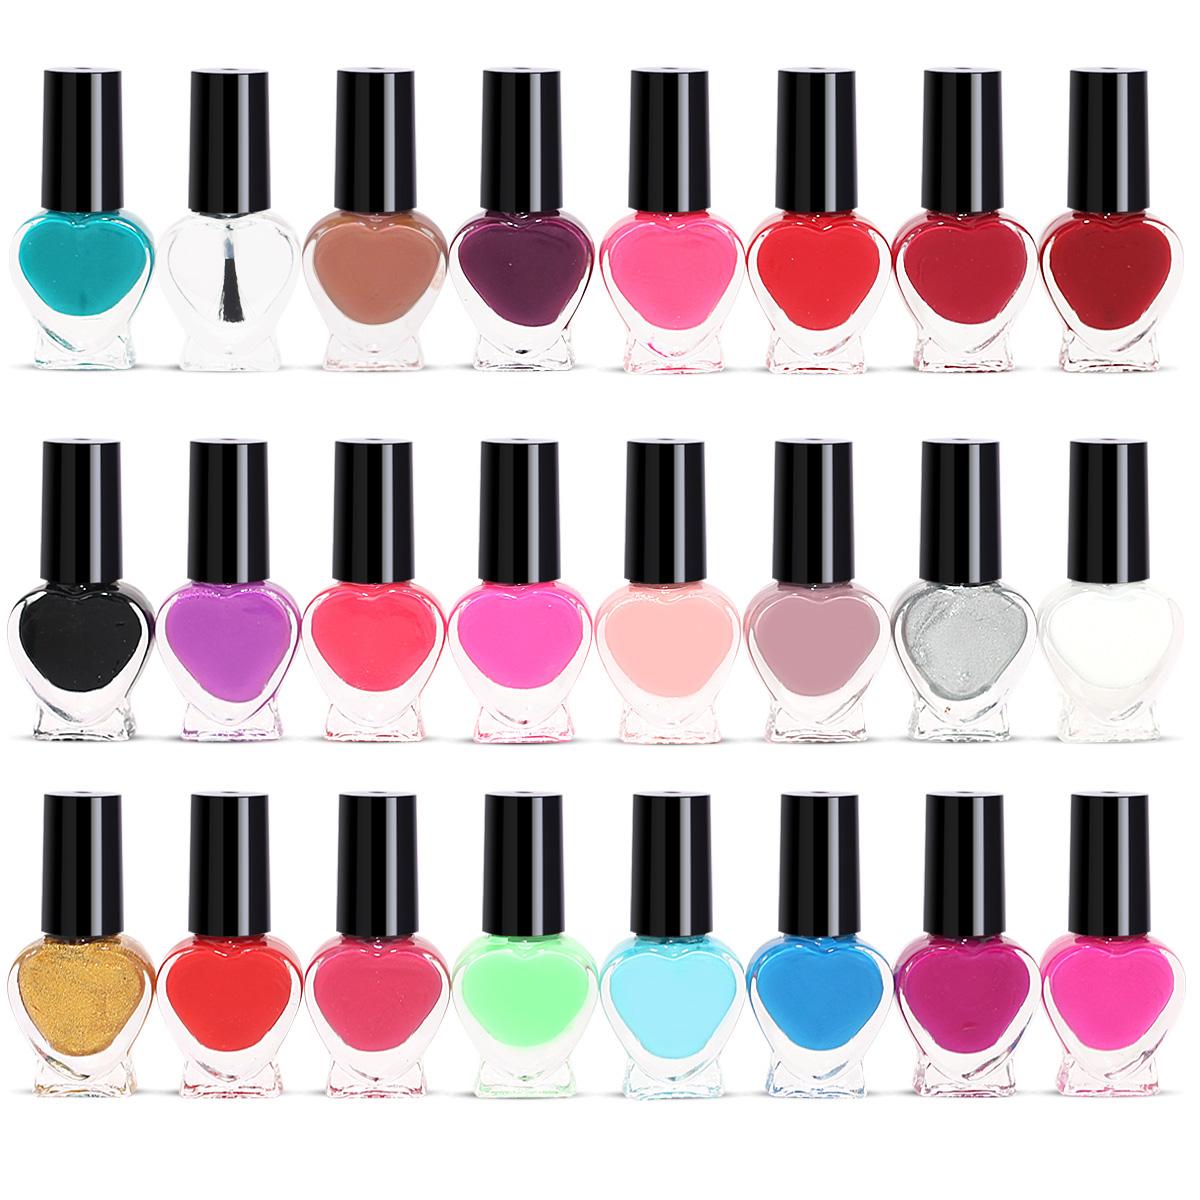 Opi Nail Varnish Colours Uk – Papillon Day Spa